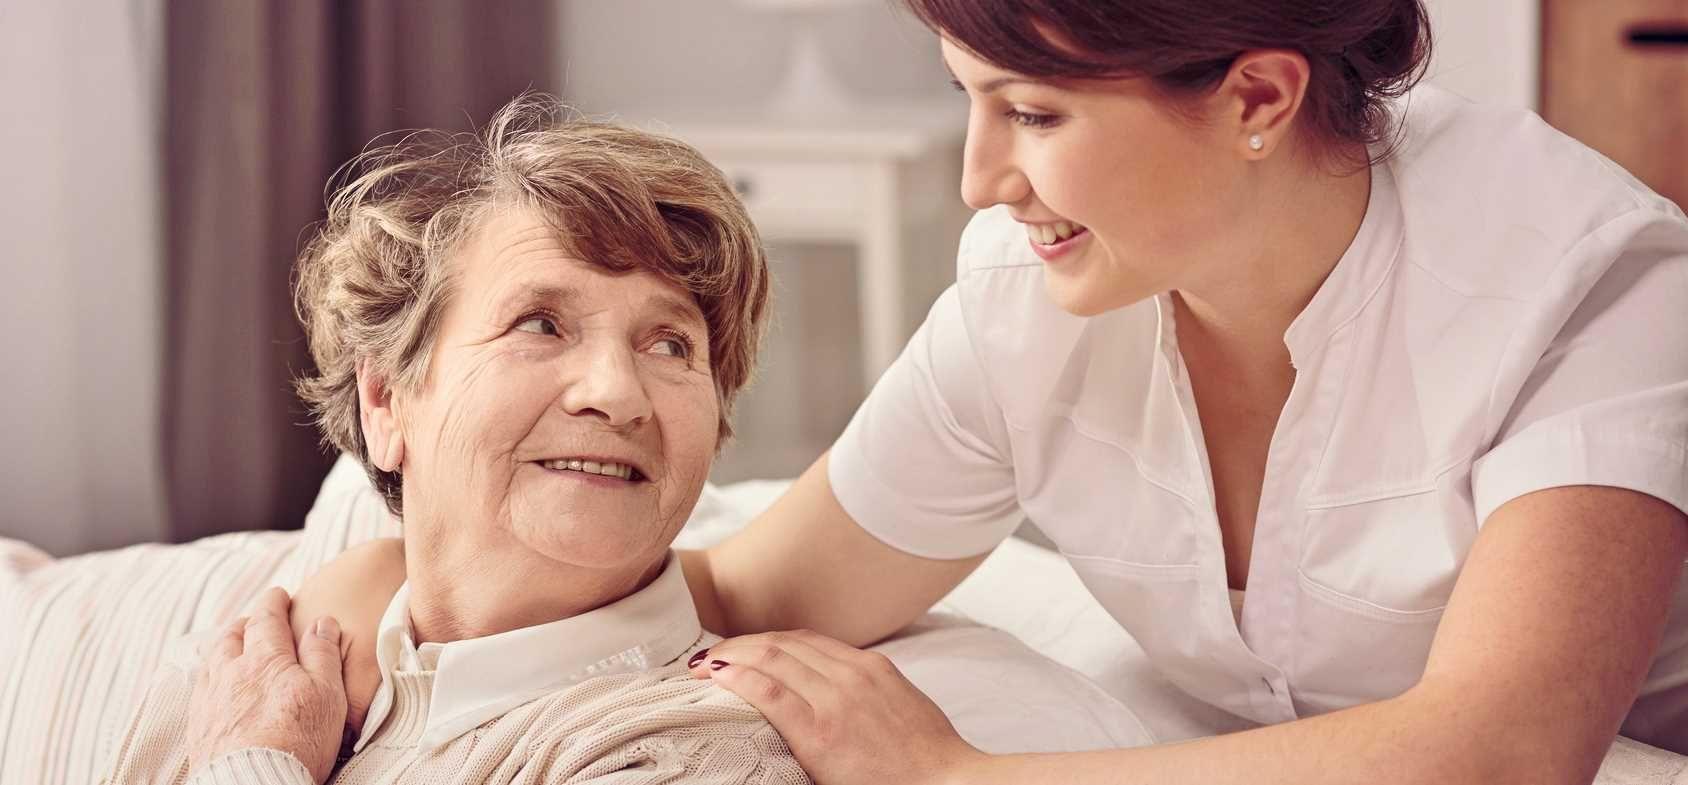 Caregiver Jobs in Springfield Missouri Can Help Improve